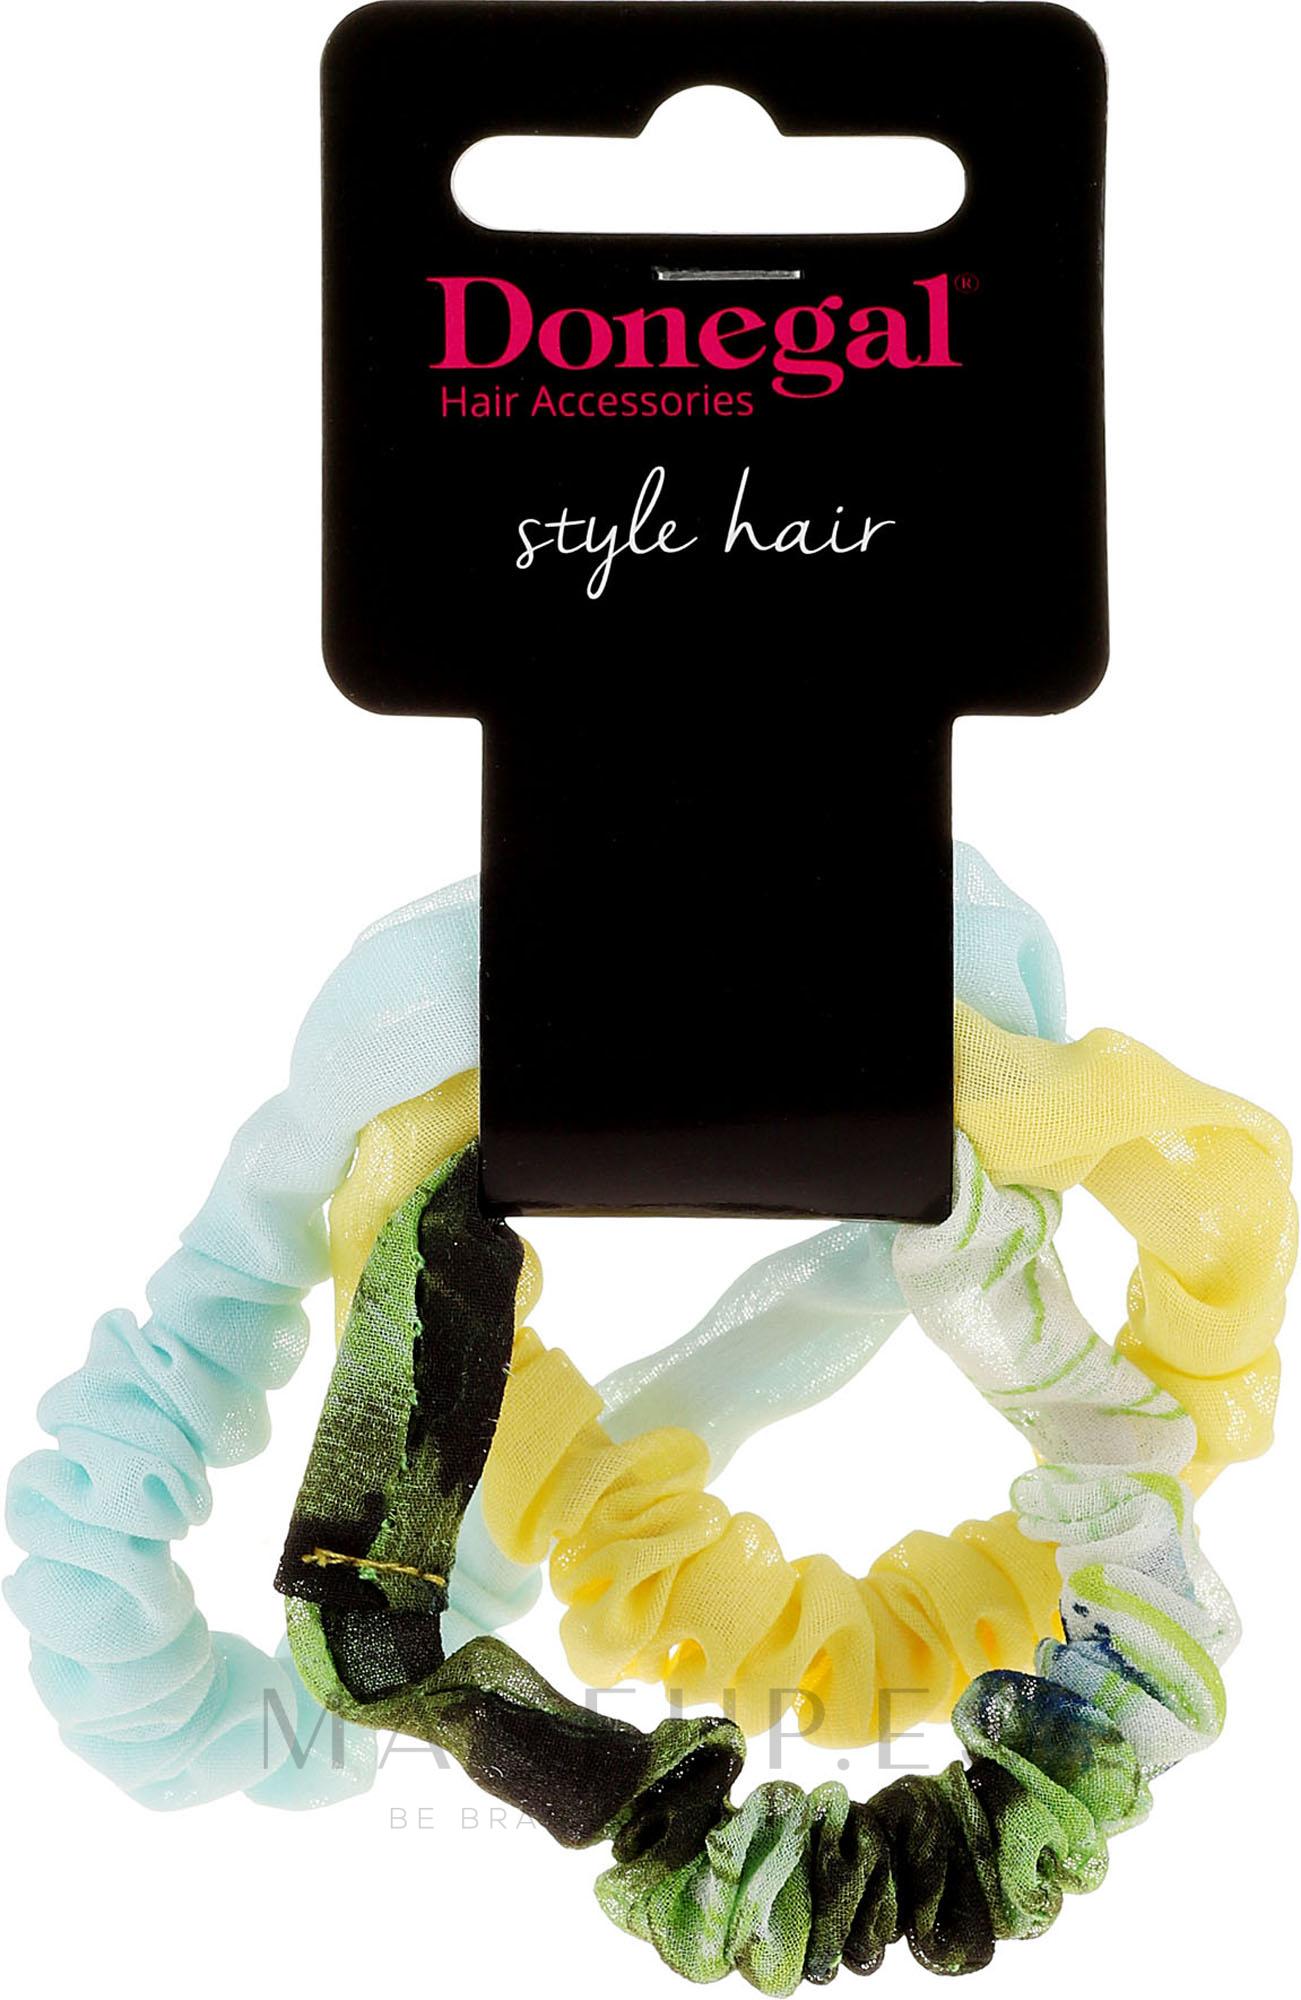 Gomas de pelo Hair Band Amazing, FA-5531 - Donegal — imagen 3 uds.